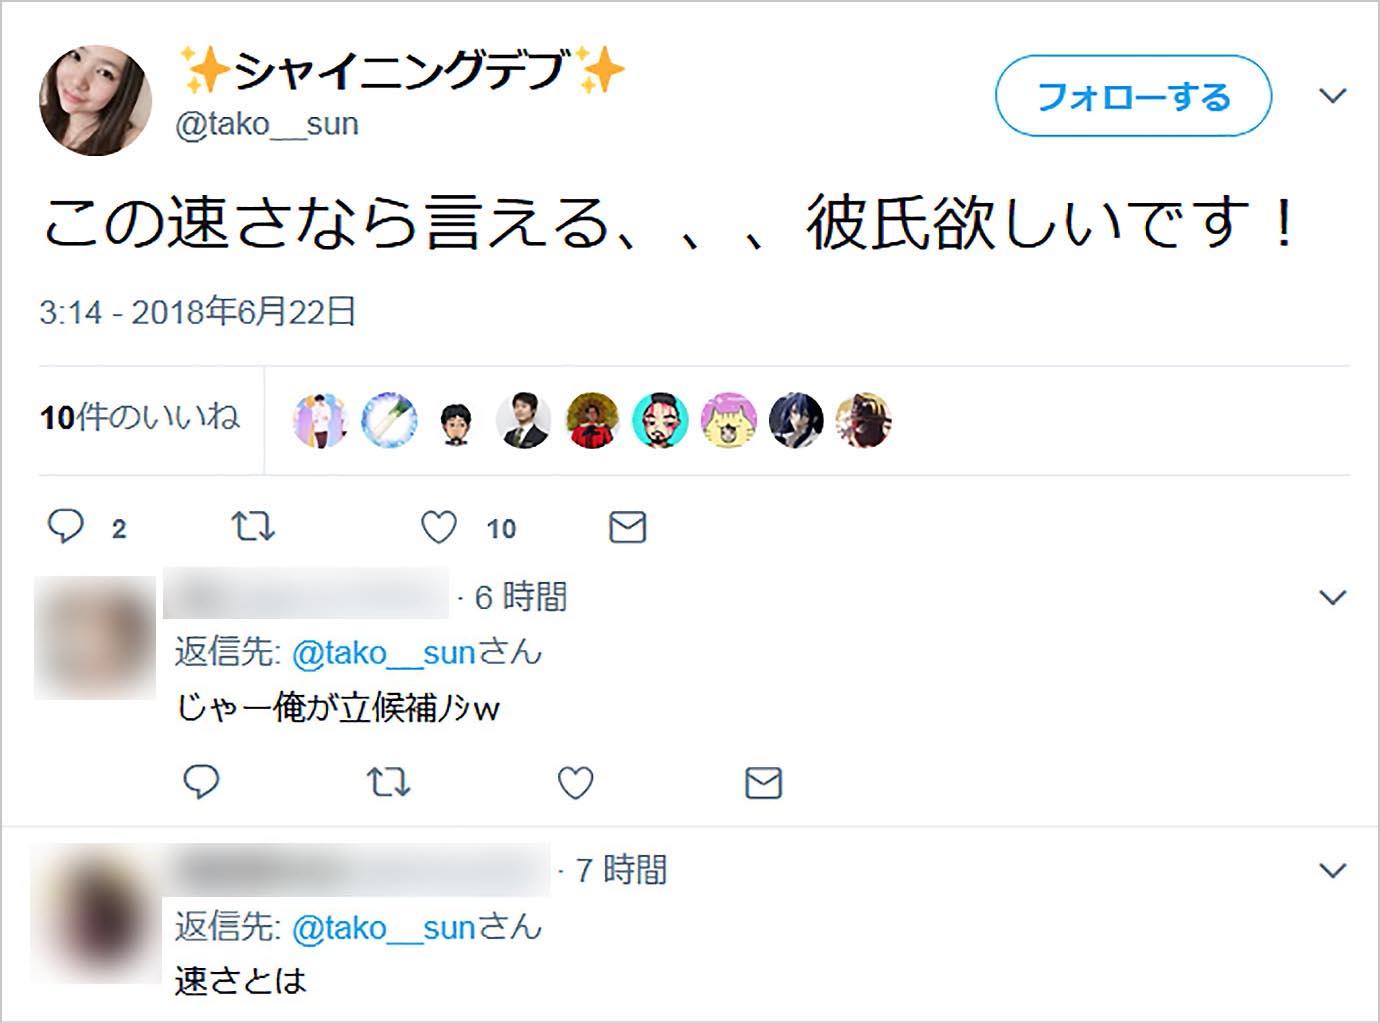 ramen-jiro-kareshi11